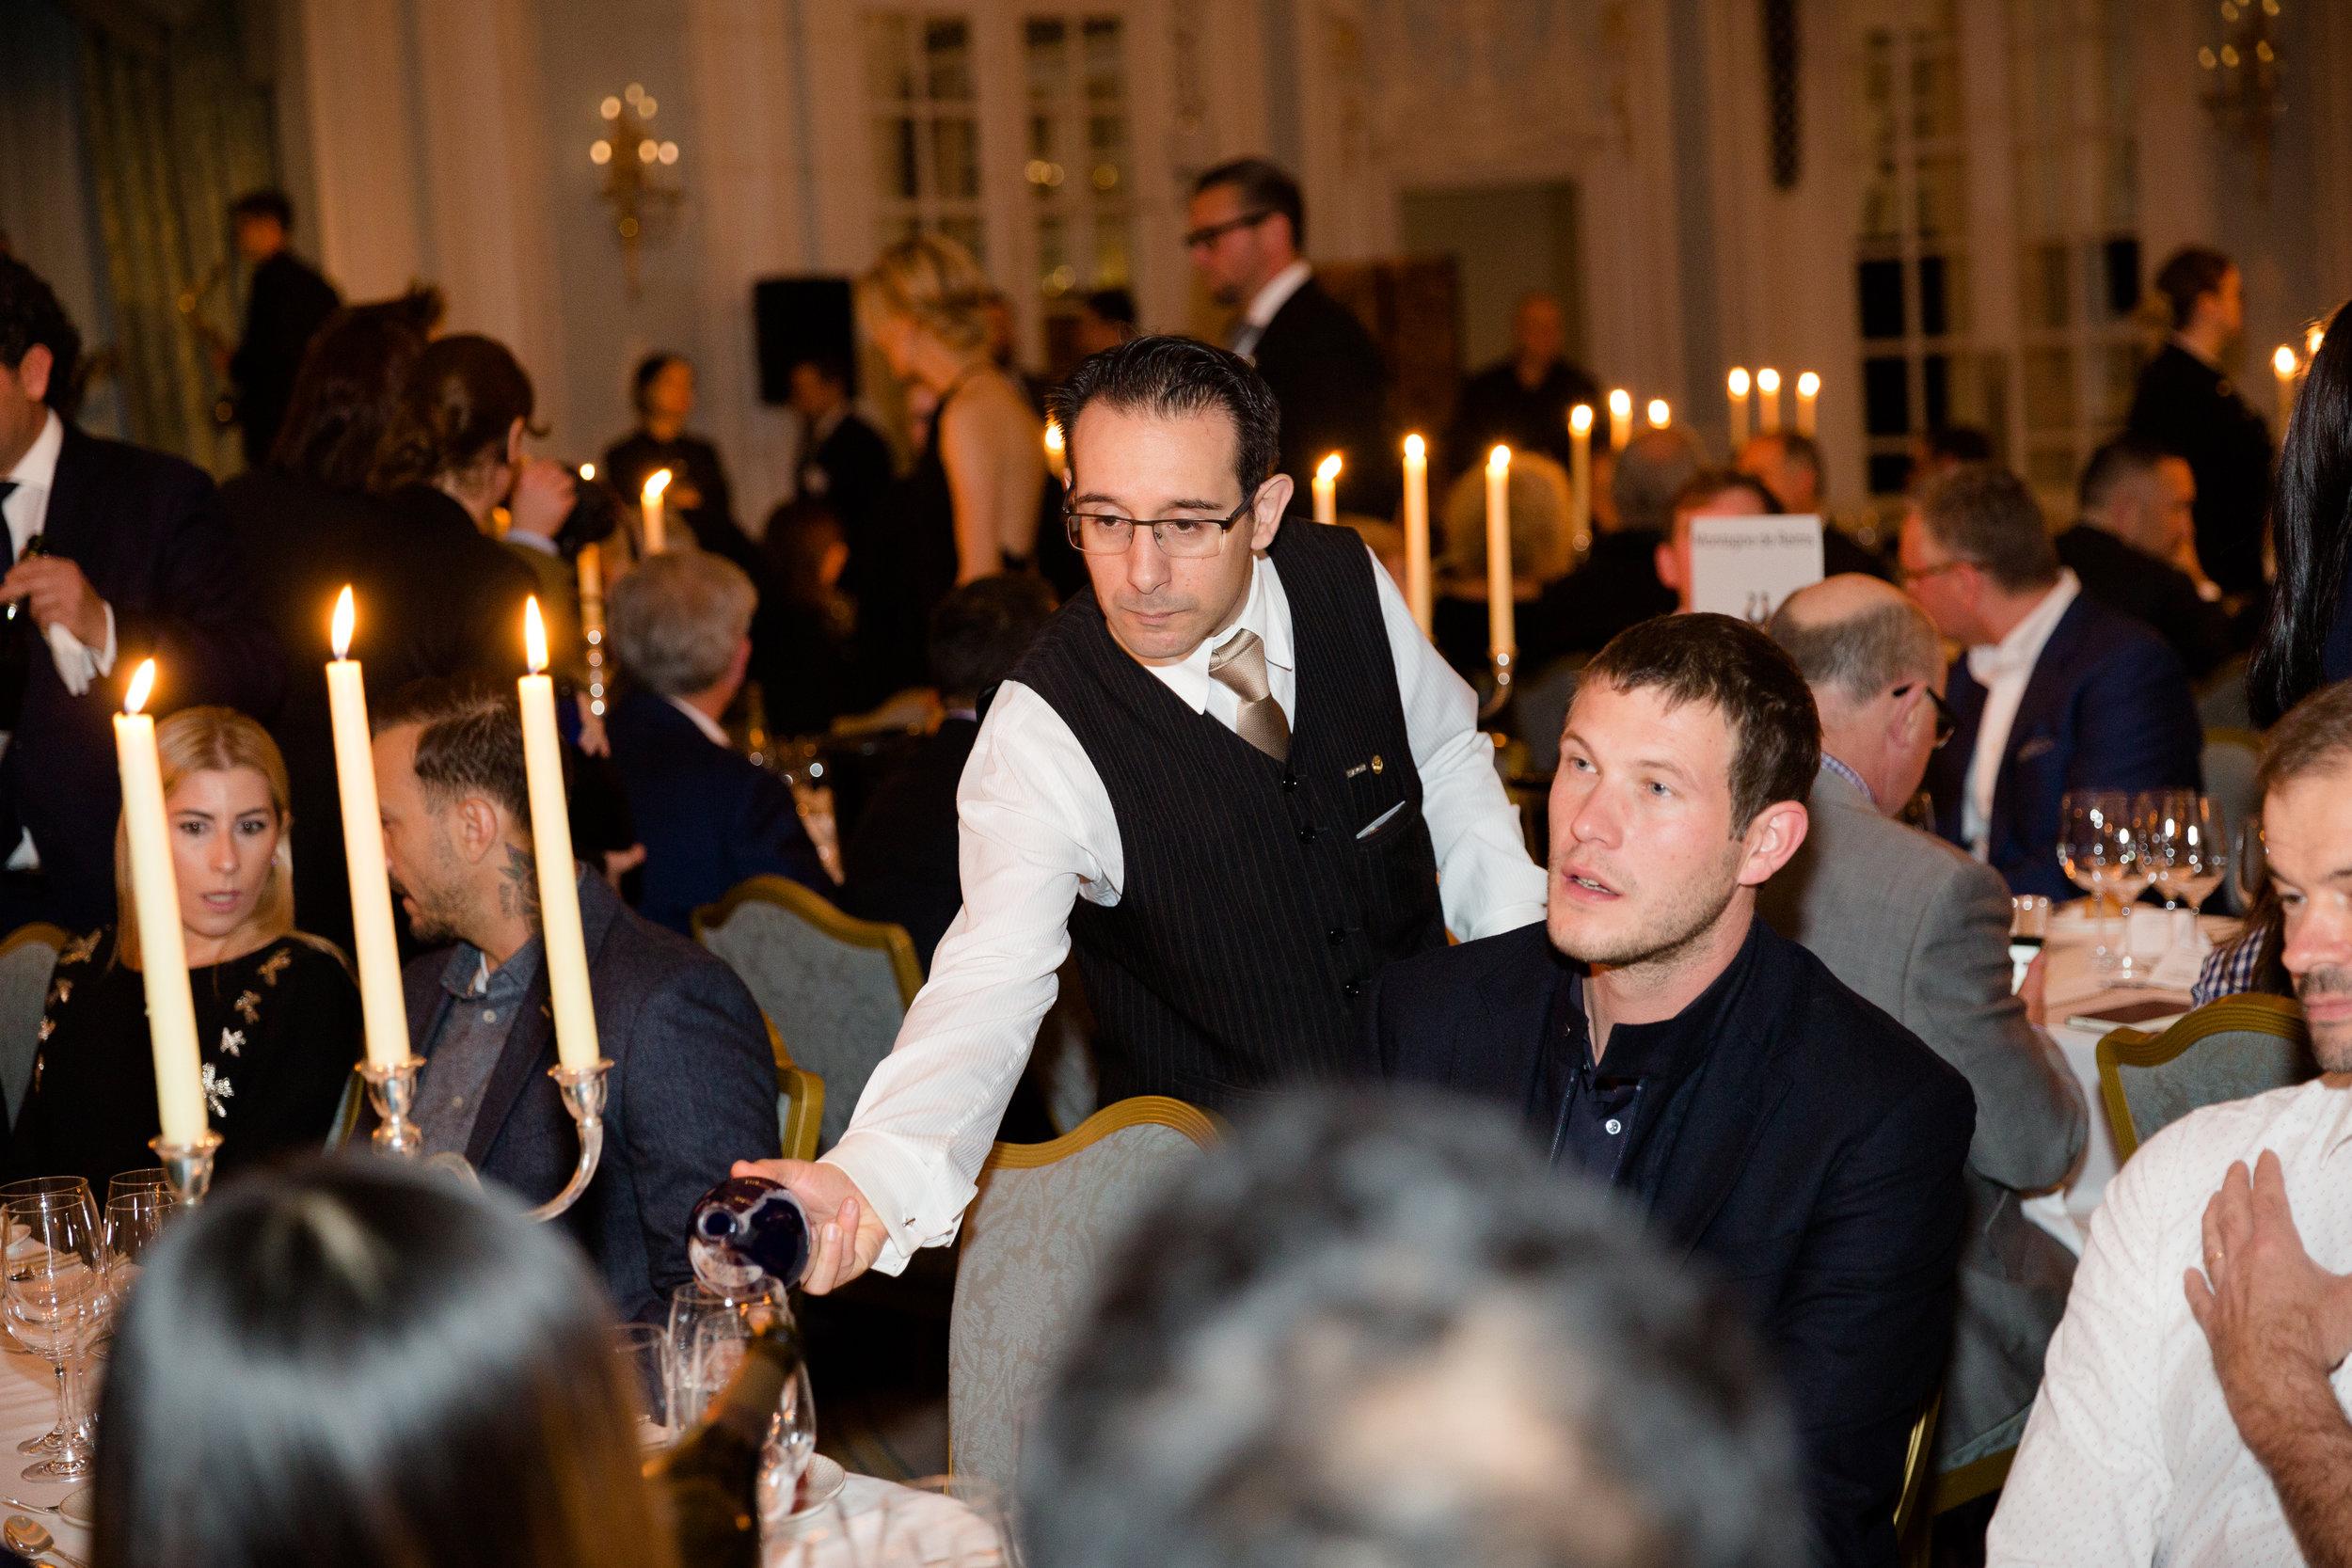 Copy of Le Fete 2nd Dinner Event Nov 2017-111.jpg